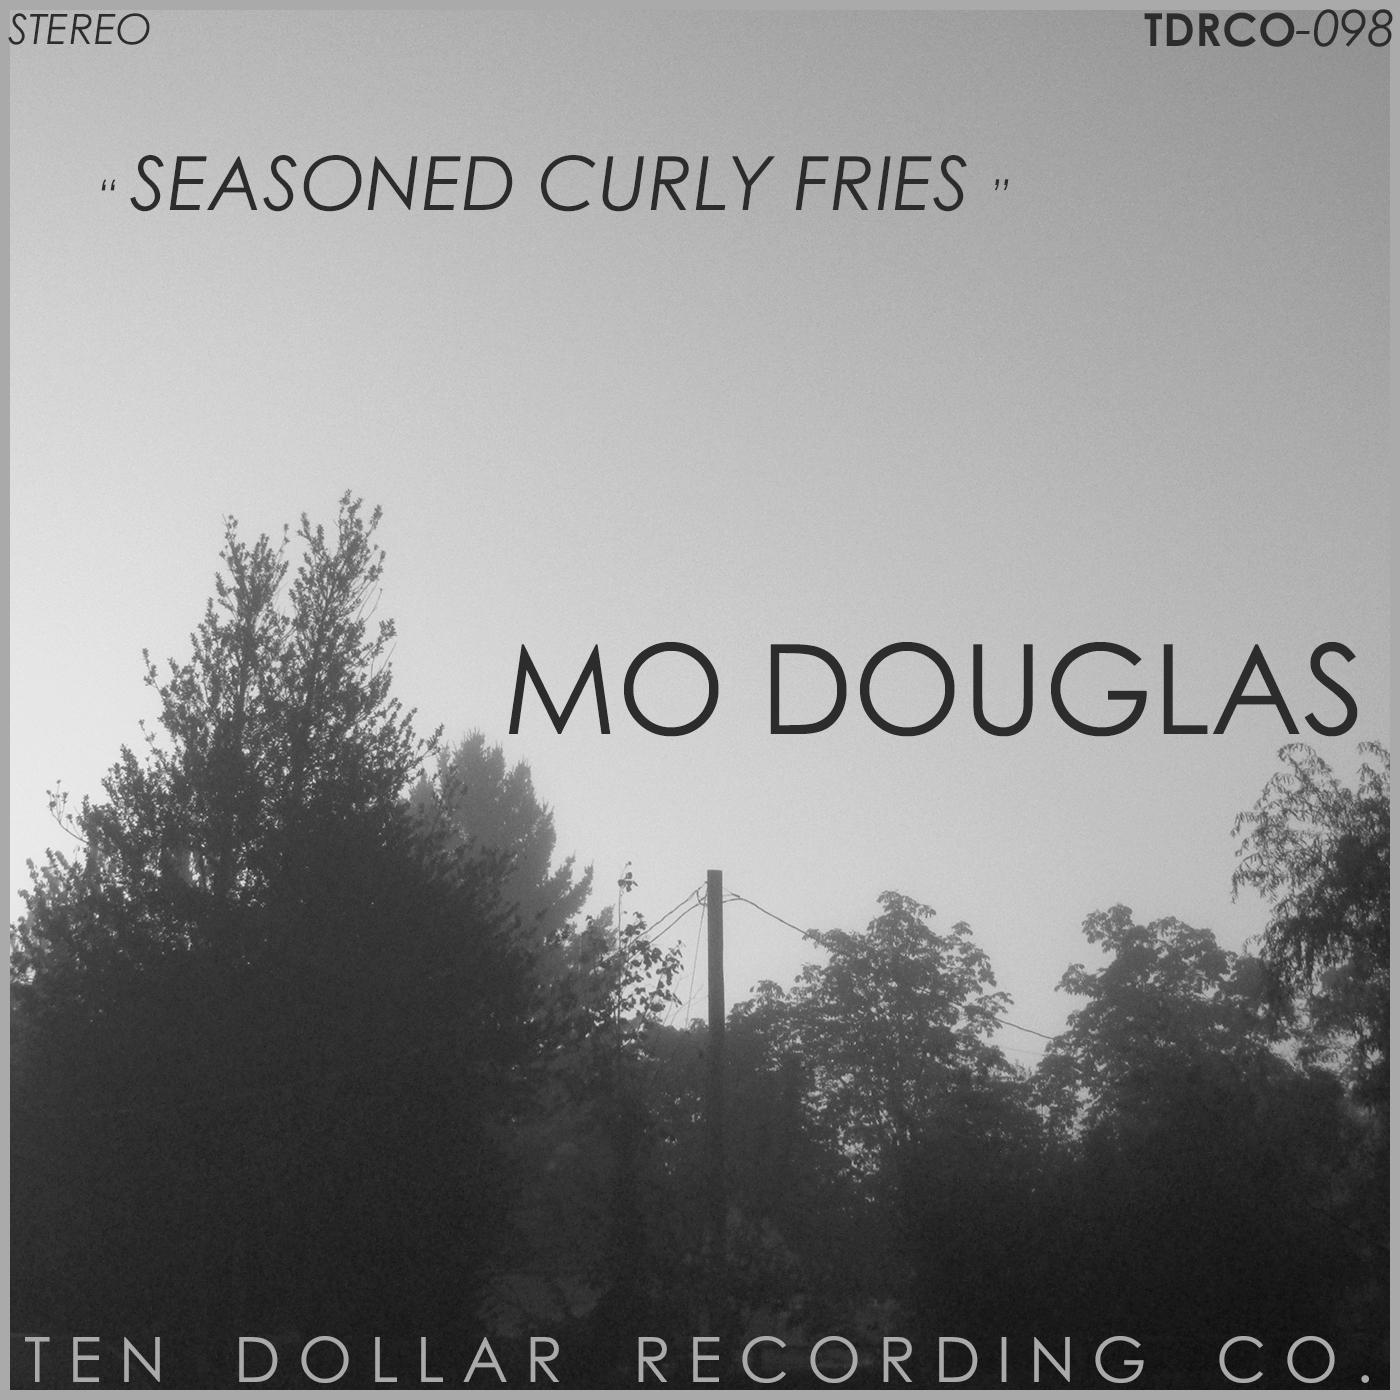 Mo Douglas - Seasoned Curly Fries (Single)